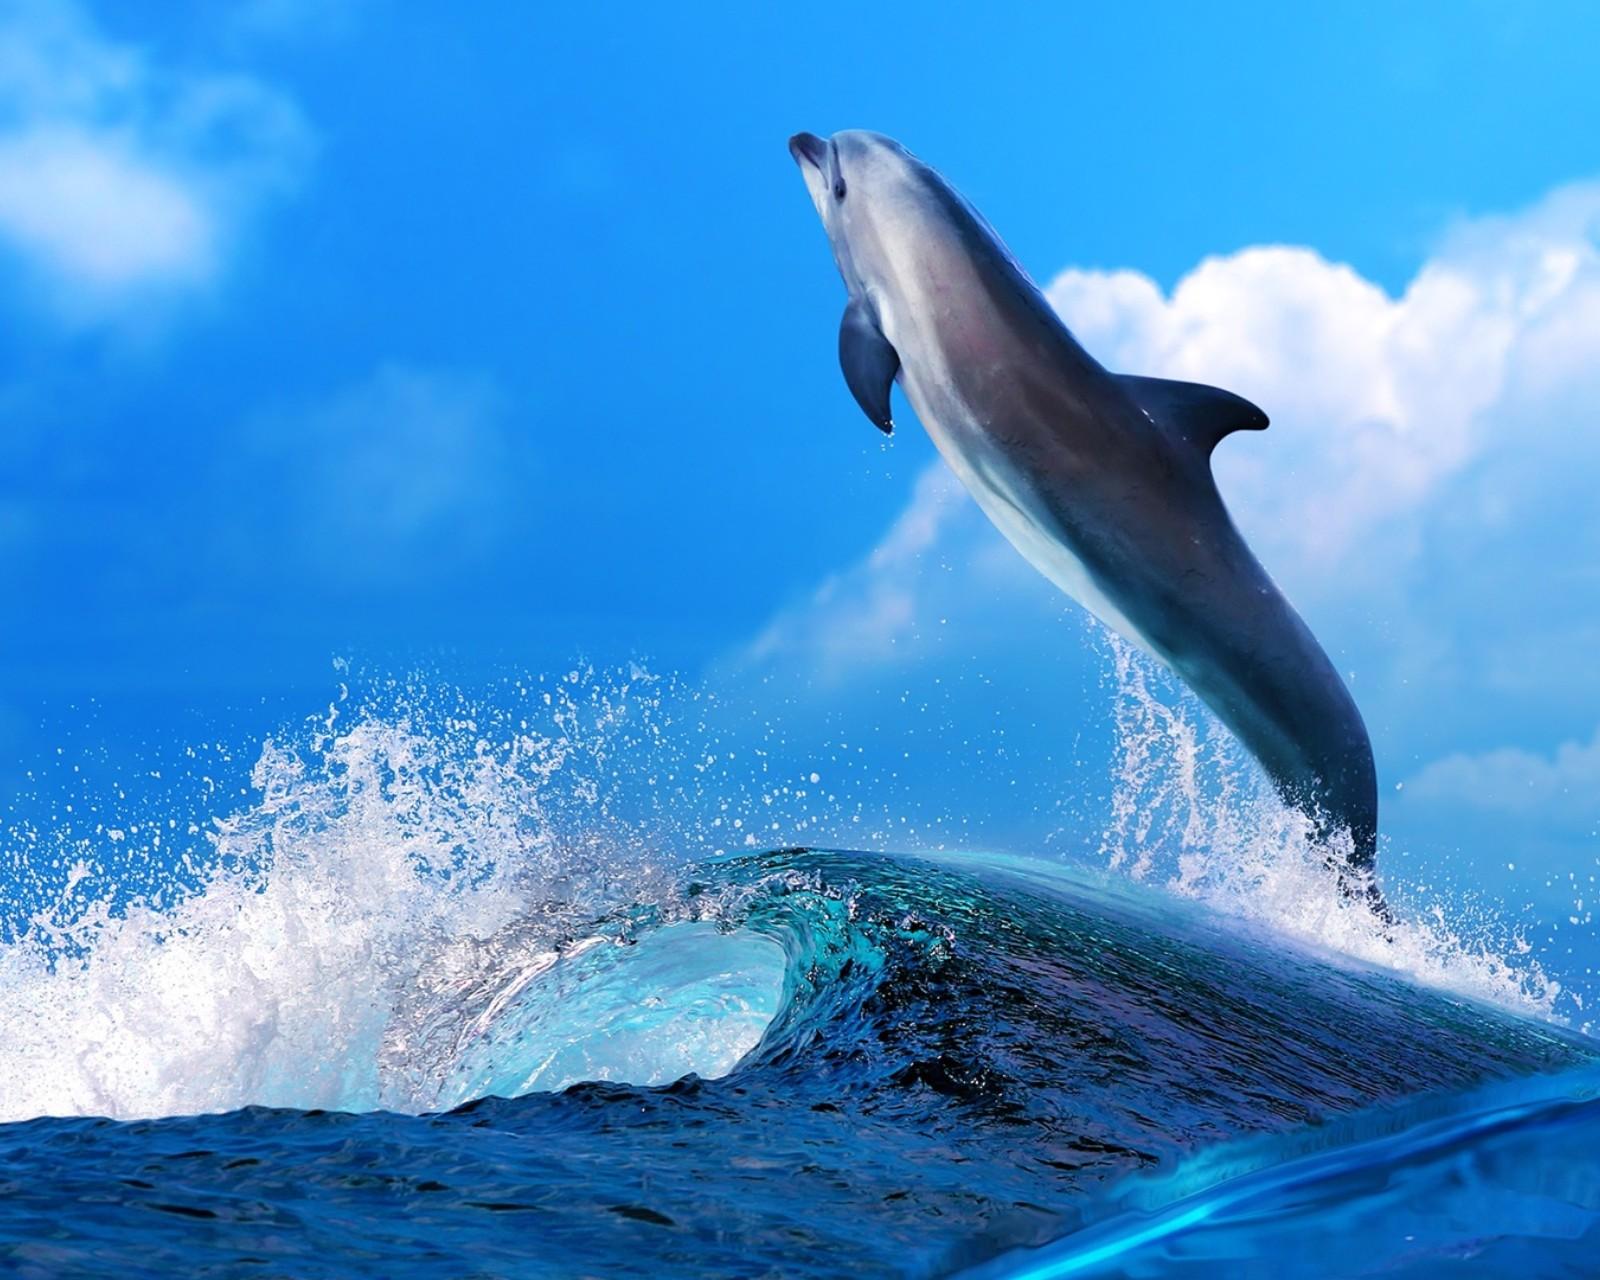 【v粉壁纸】可爱动物海豚壁纸